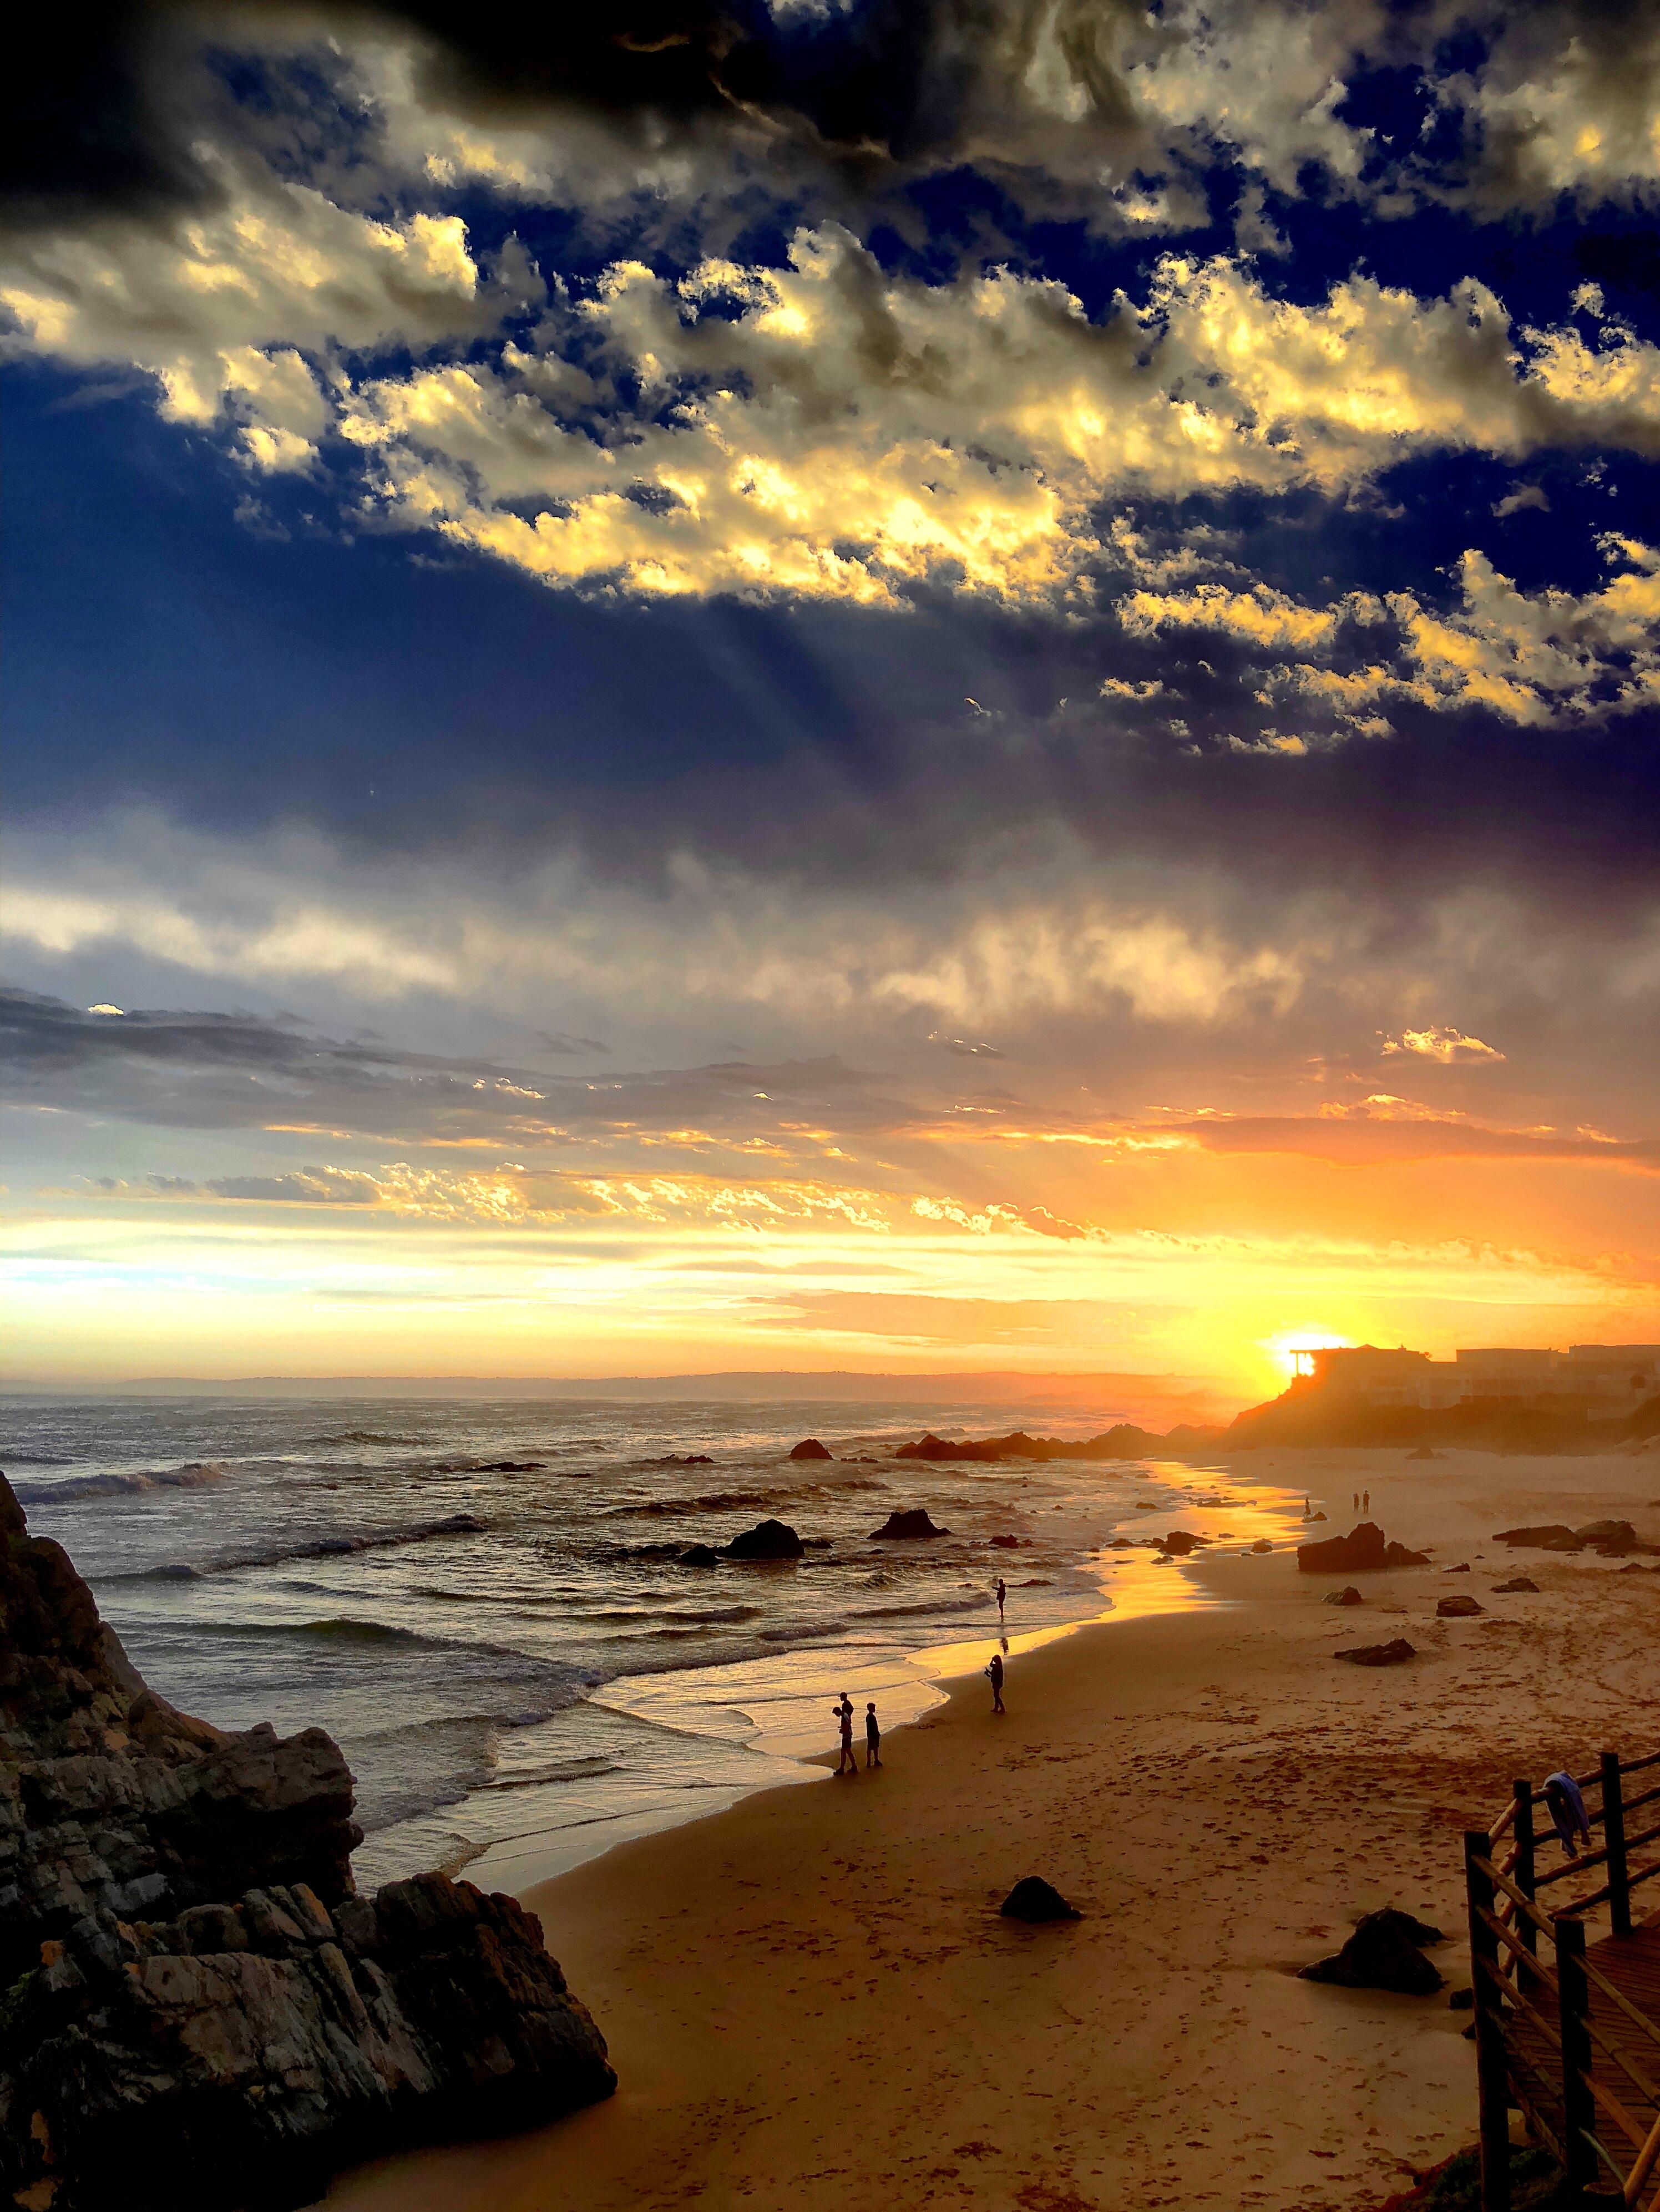 Sonnenuntergang bei Enrico, Plettenberg Bay, Südafrika